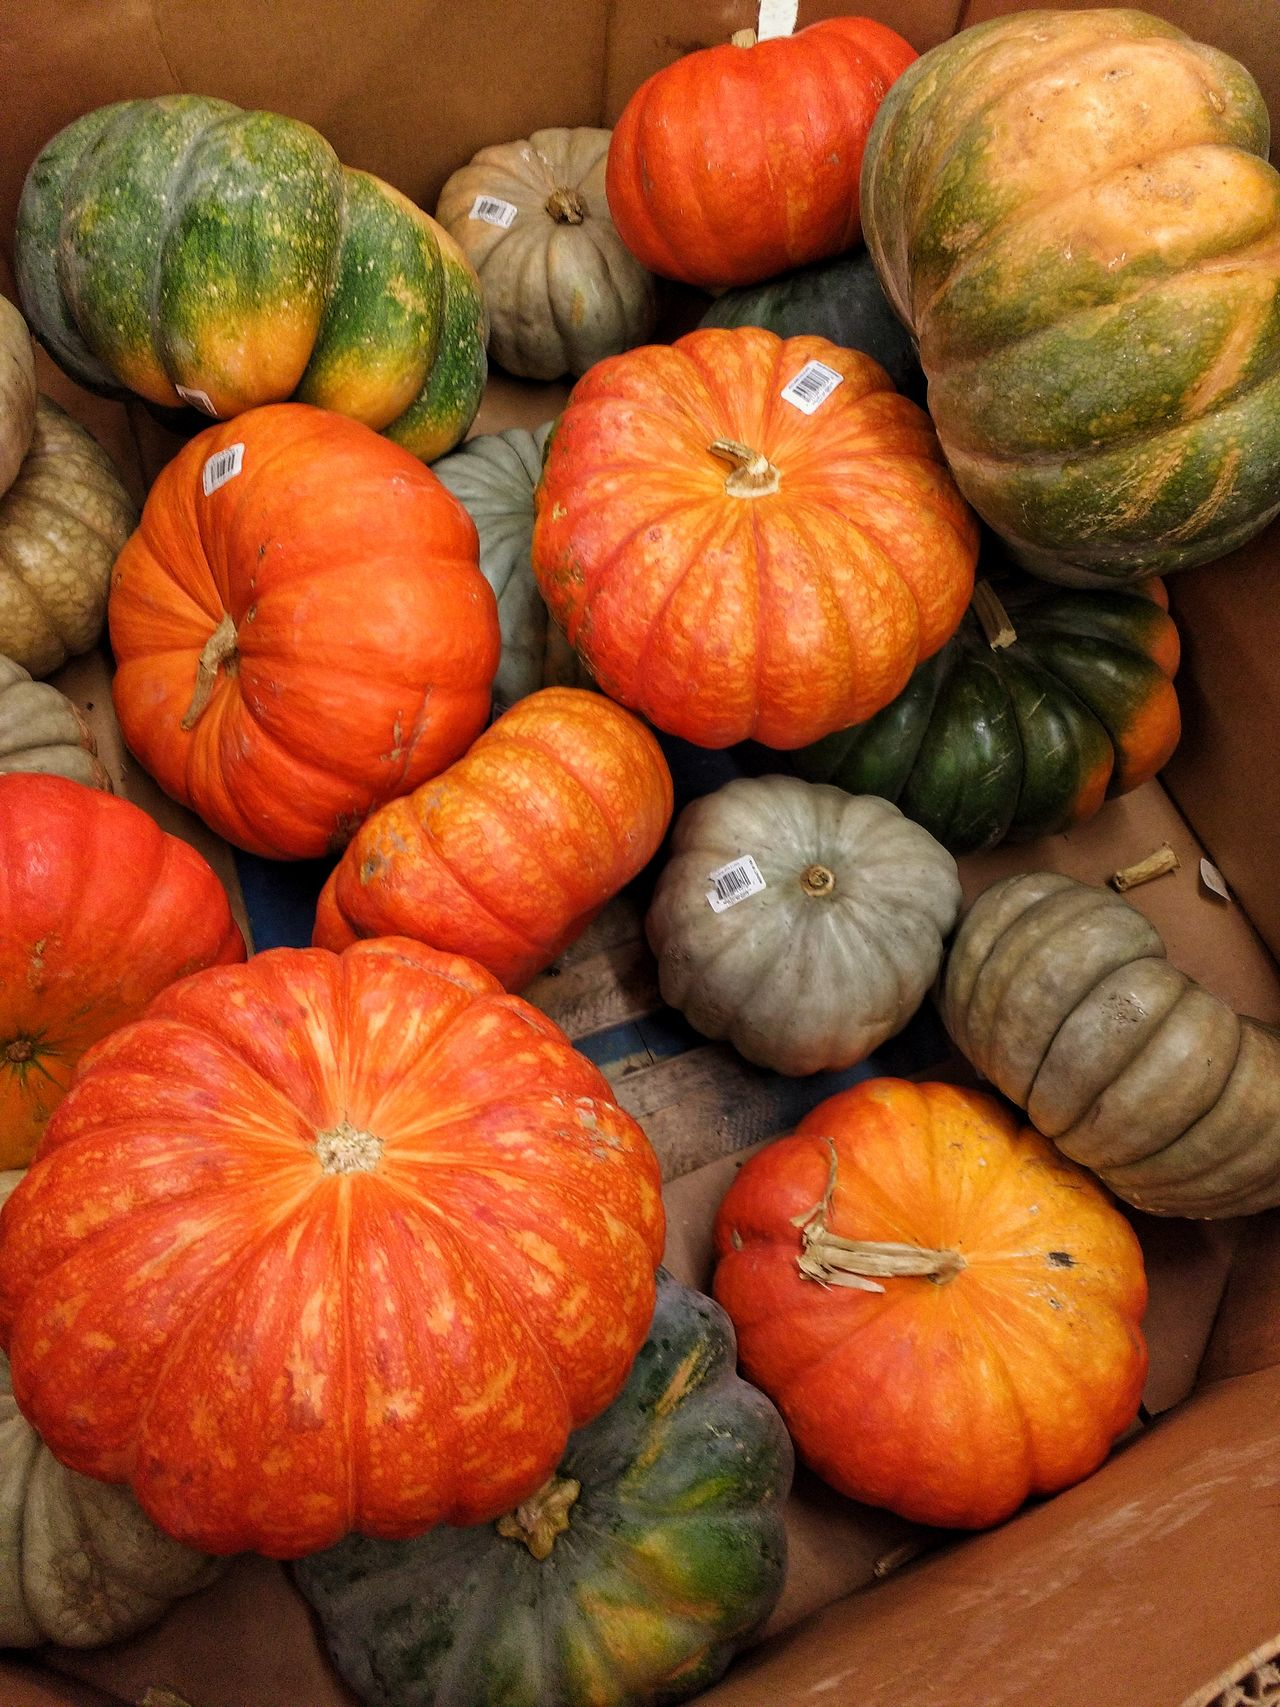 Walmart Pumpkins Vegetables Food Display Market Stall